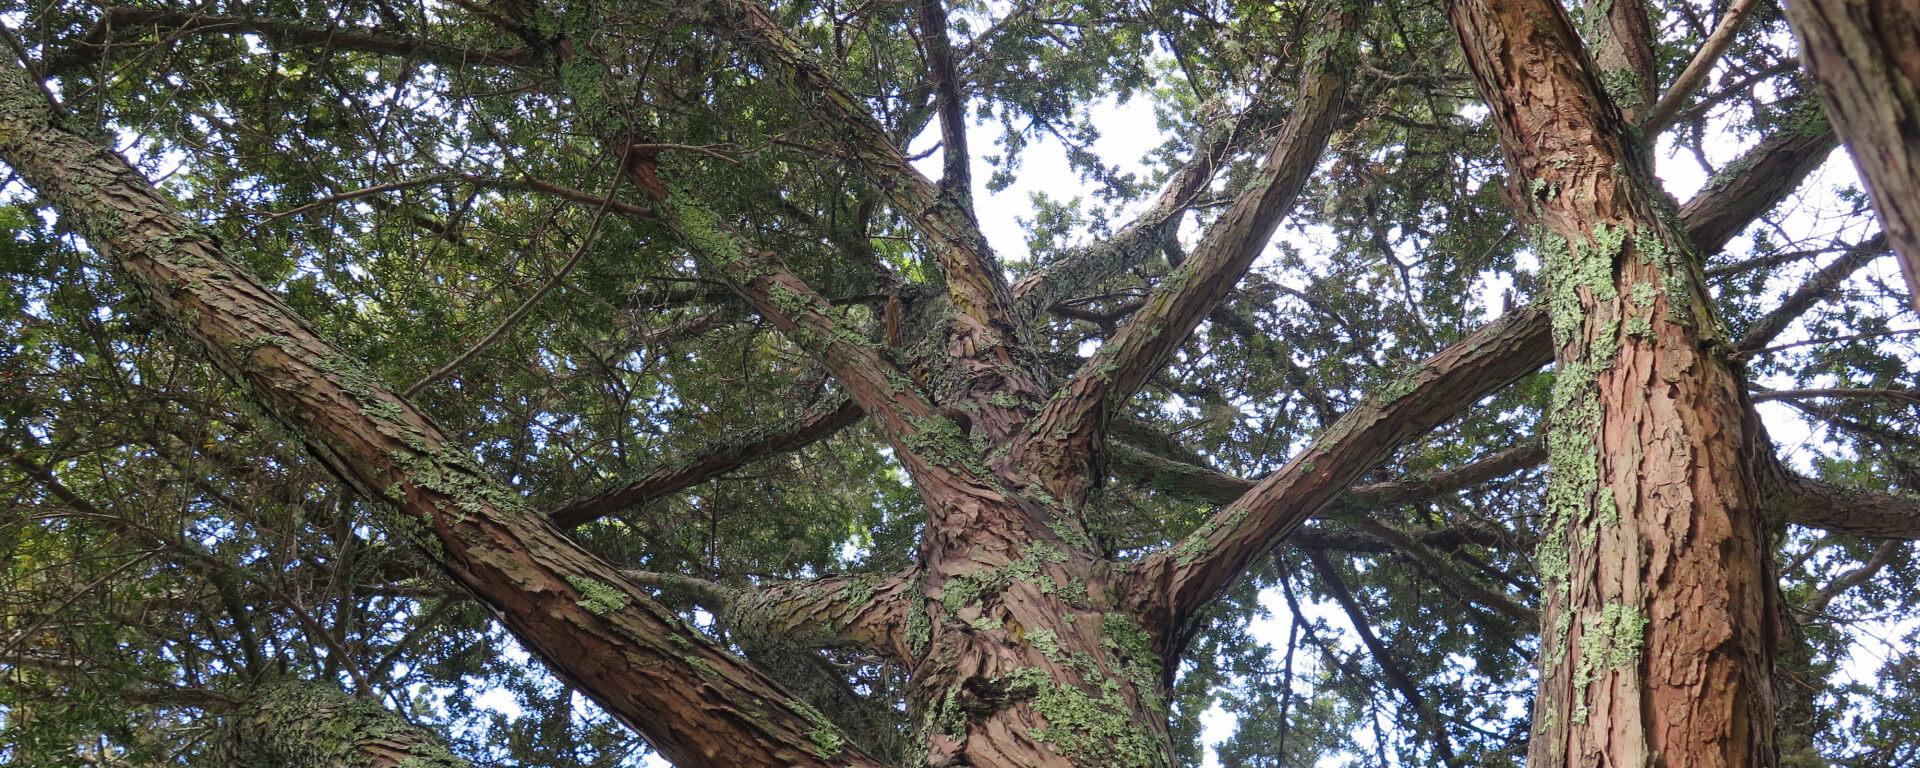 Tōtara – Podocarpus totara